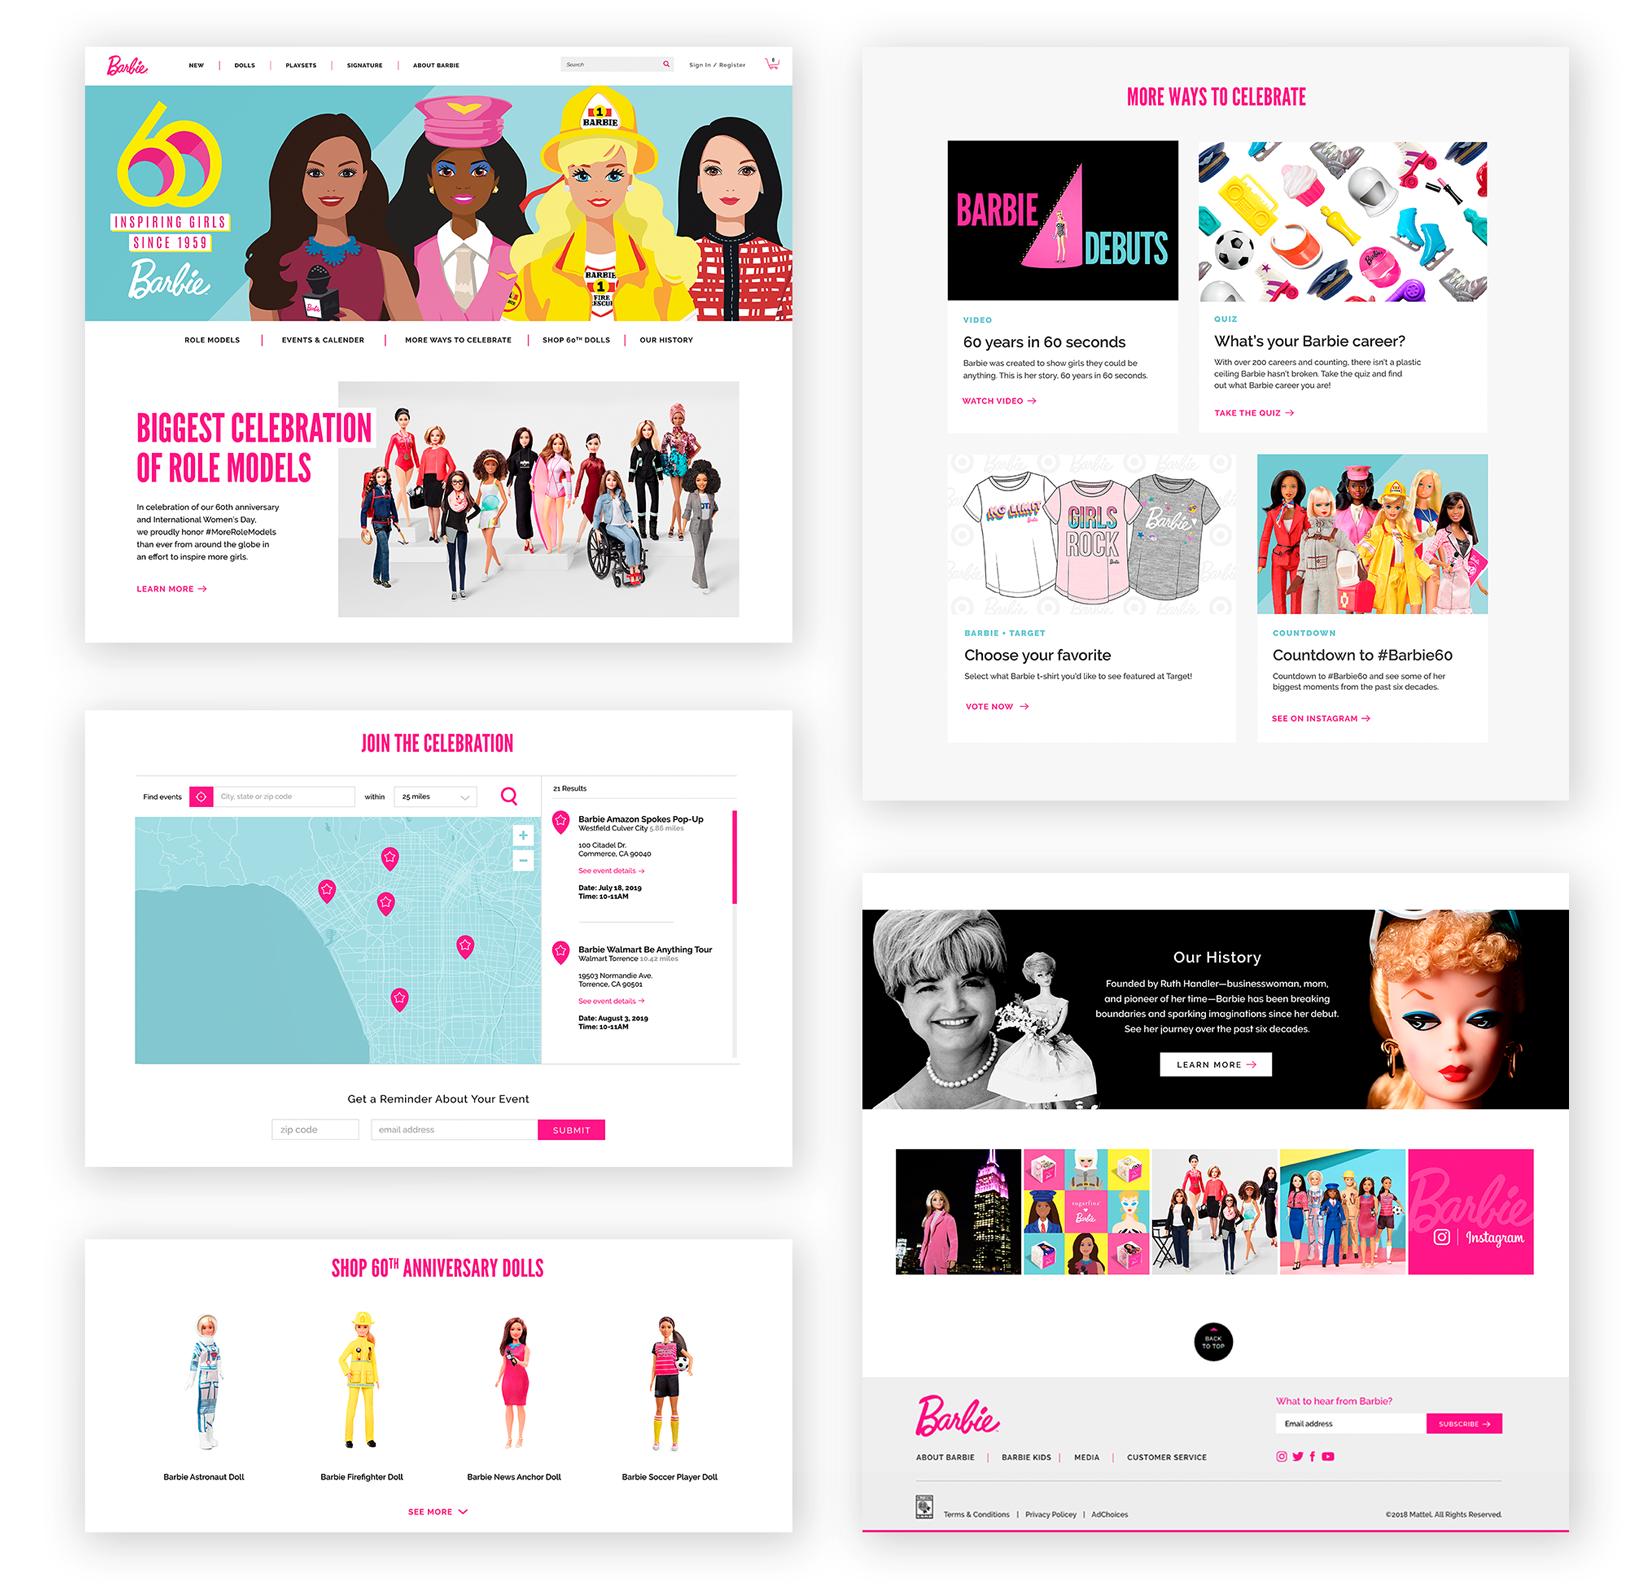 Barbie.com // Anniversary Campaign Page